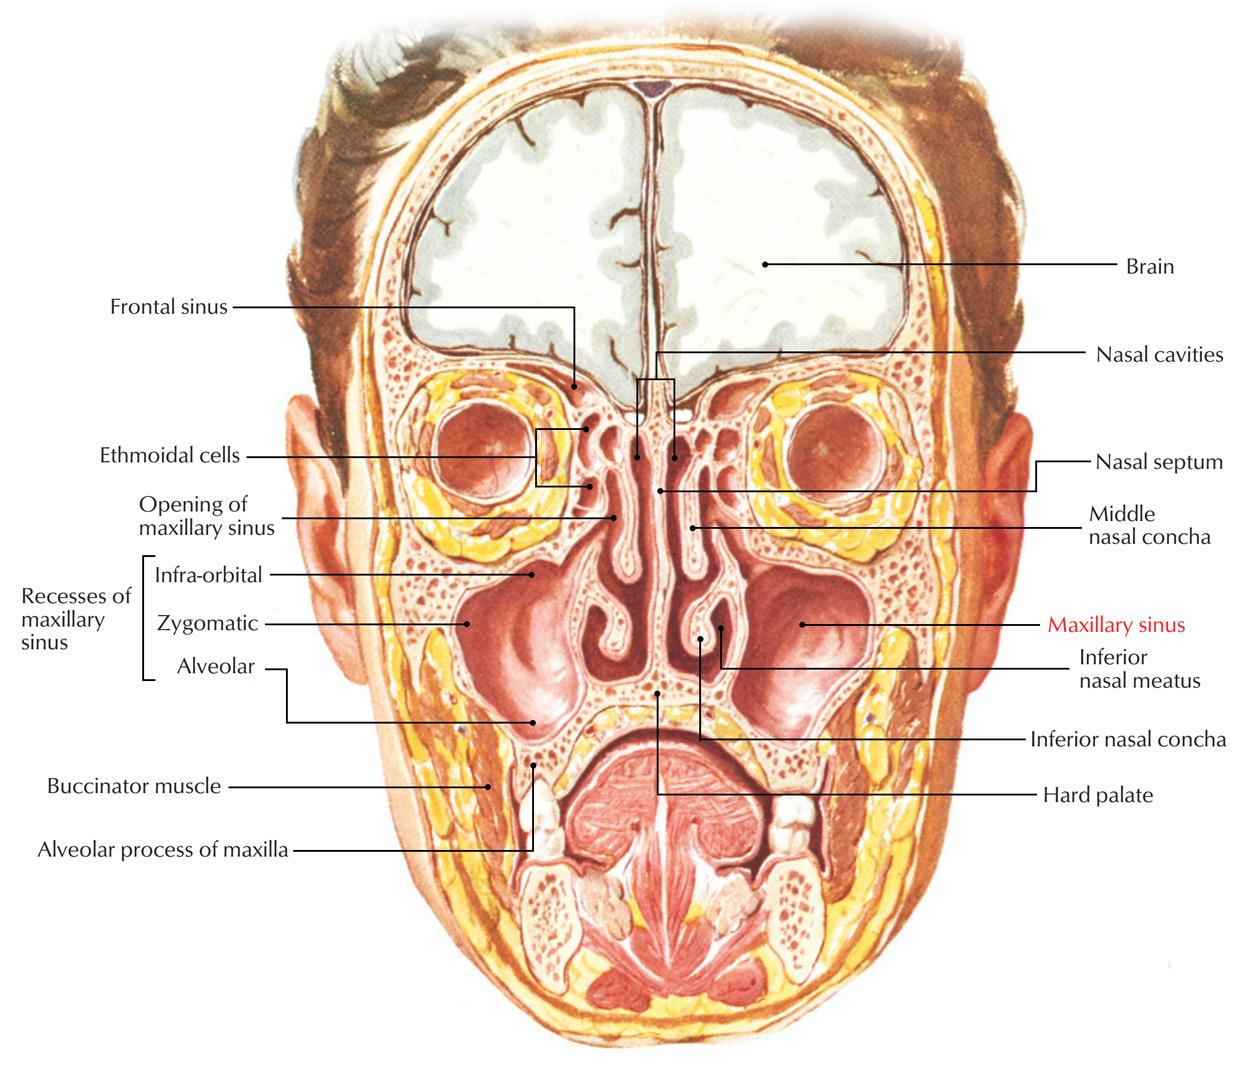 hight resolution of maxillary sinus relations